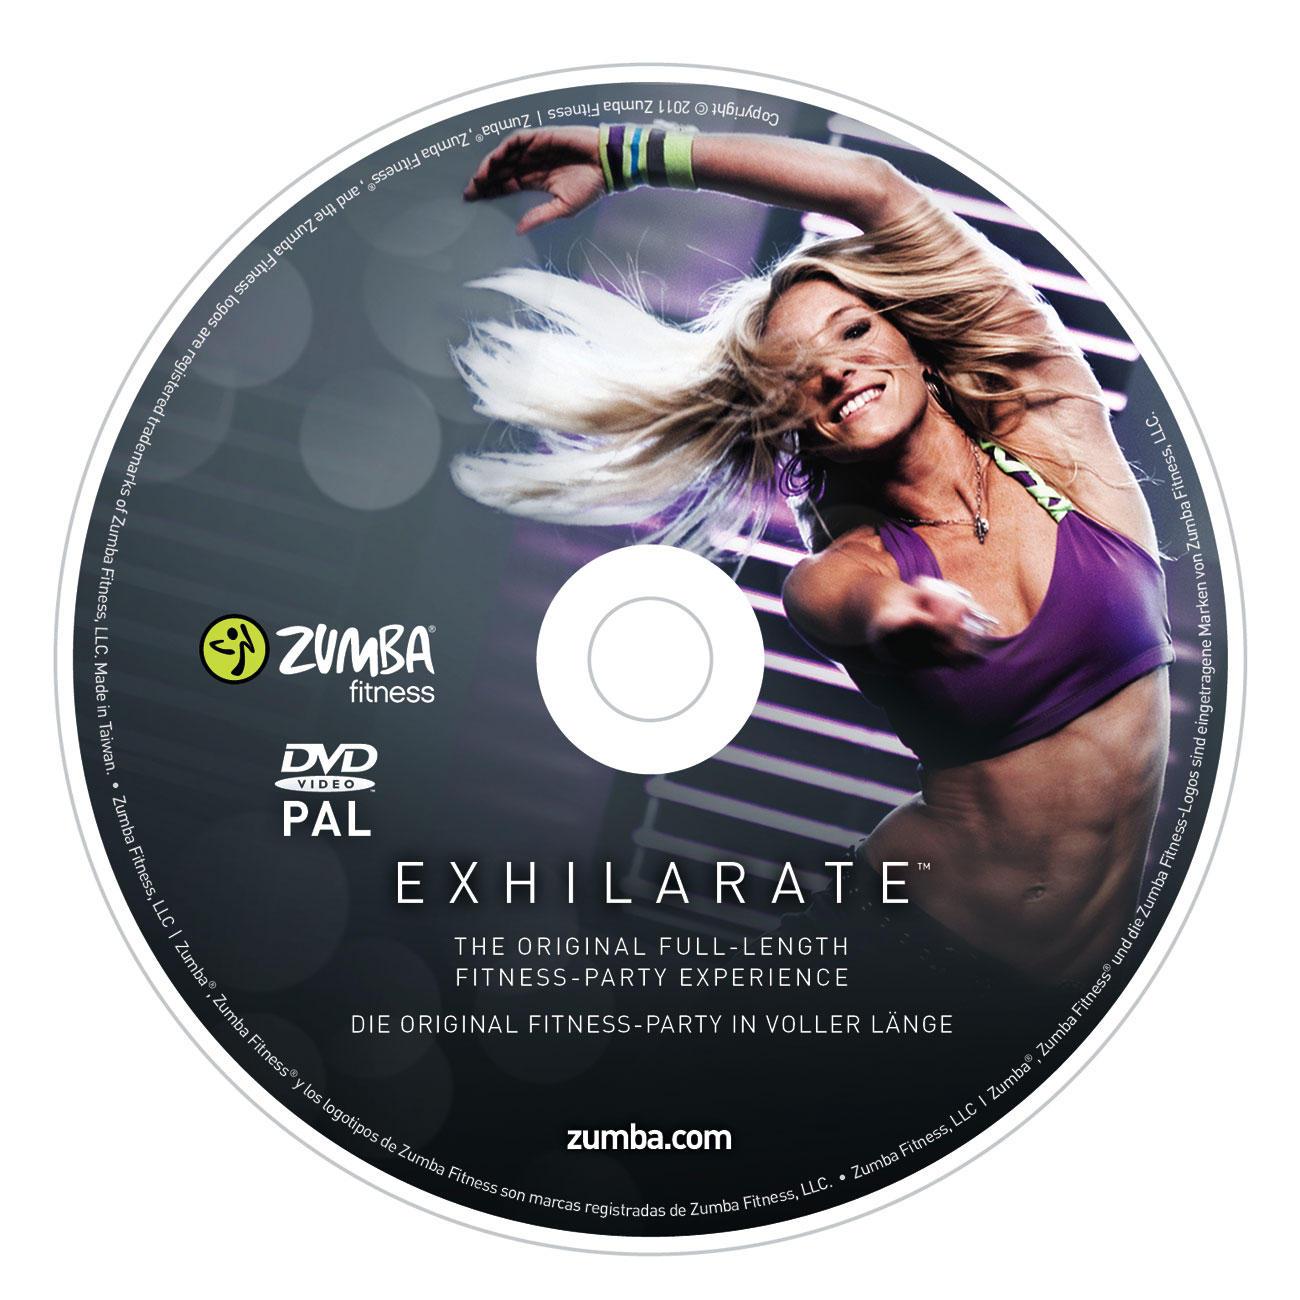 Zumba  174  Fitness Exhilarate    DVD-ProgrammZumba Fitness Exhilarate Dvd